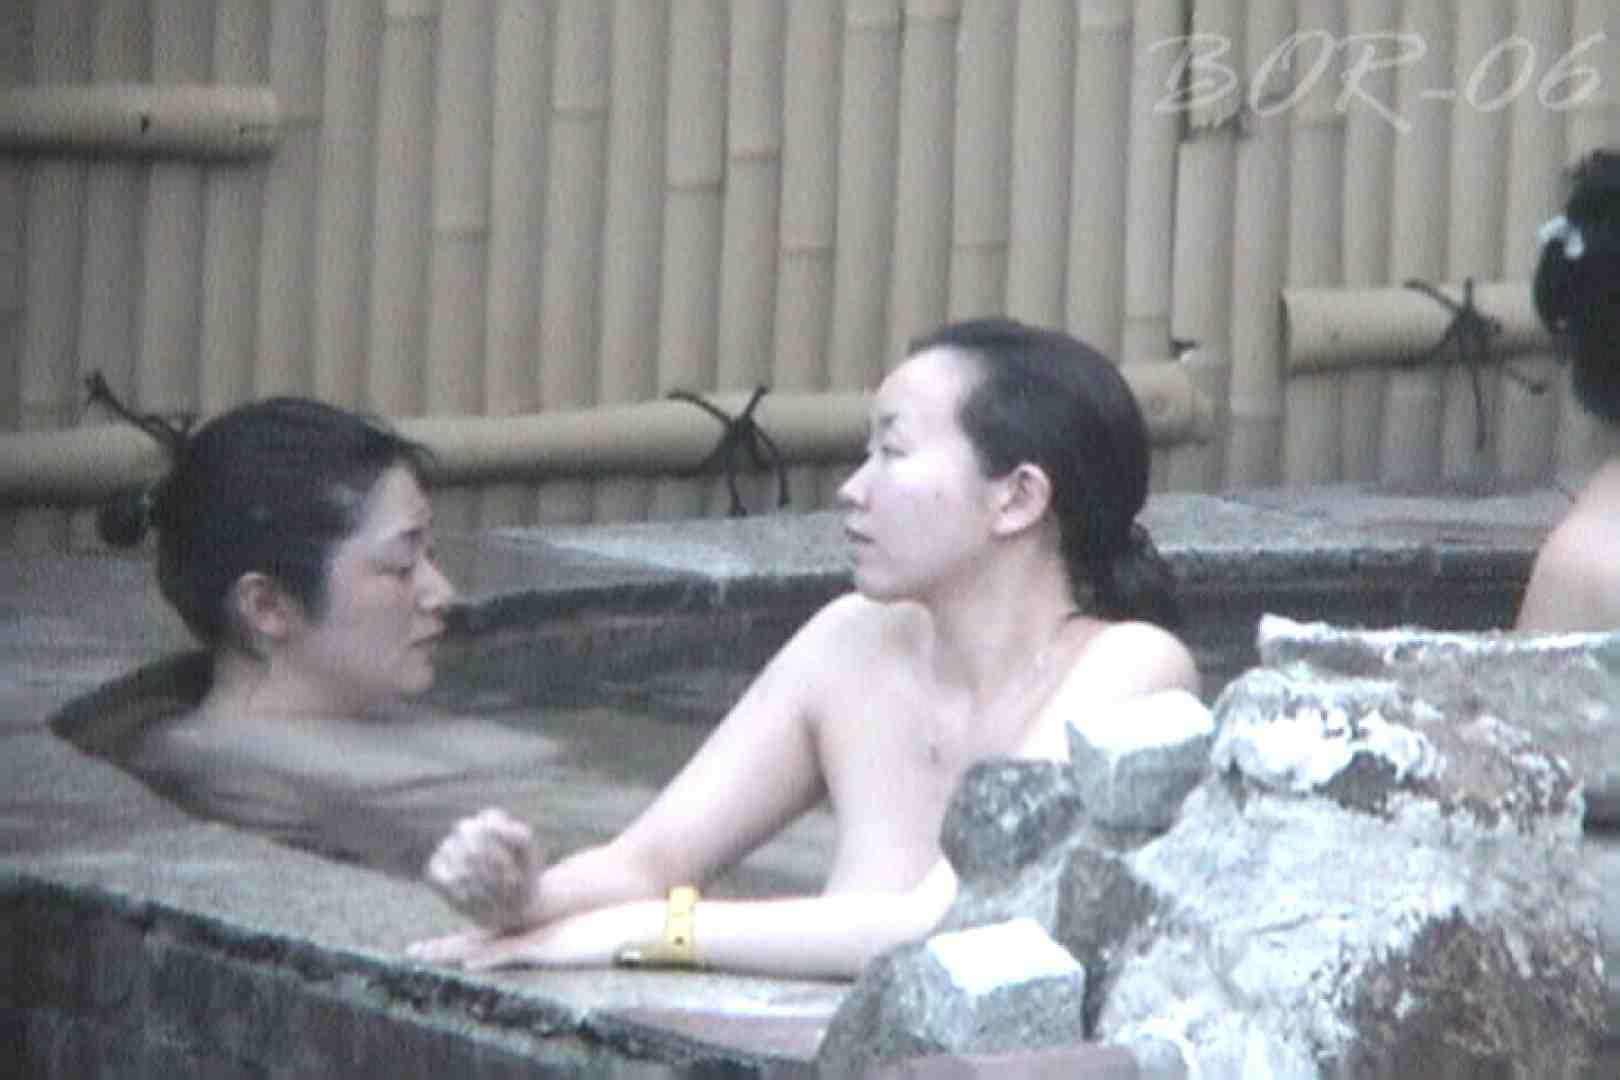 Aquaな露天風呂Vol.519 HなOL   盗撮  86pic 22